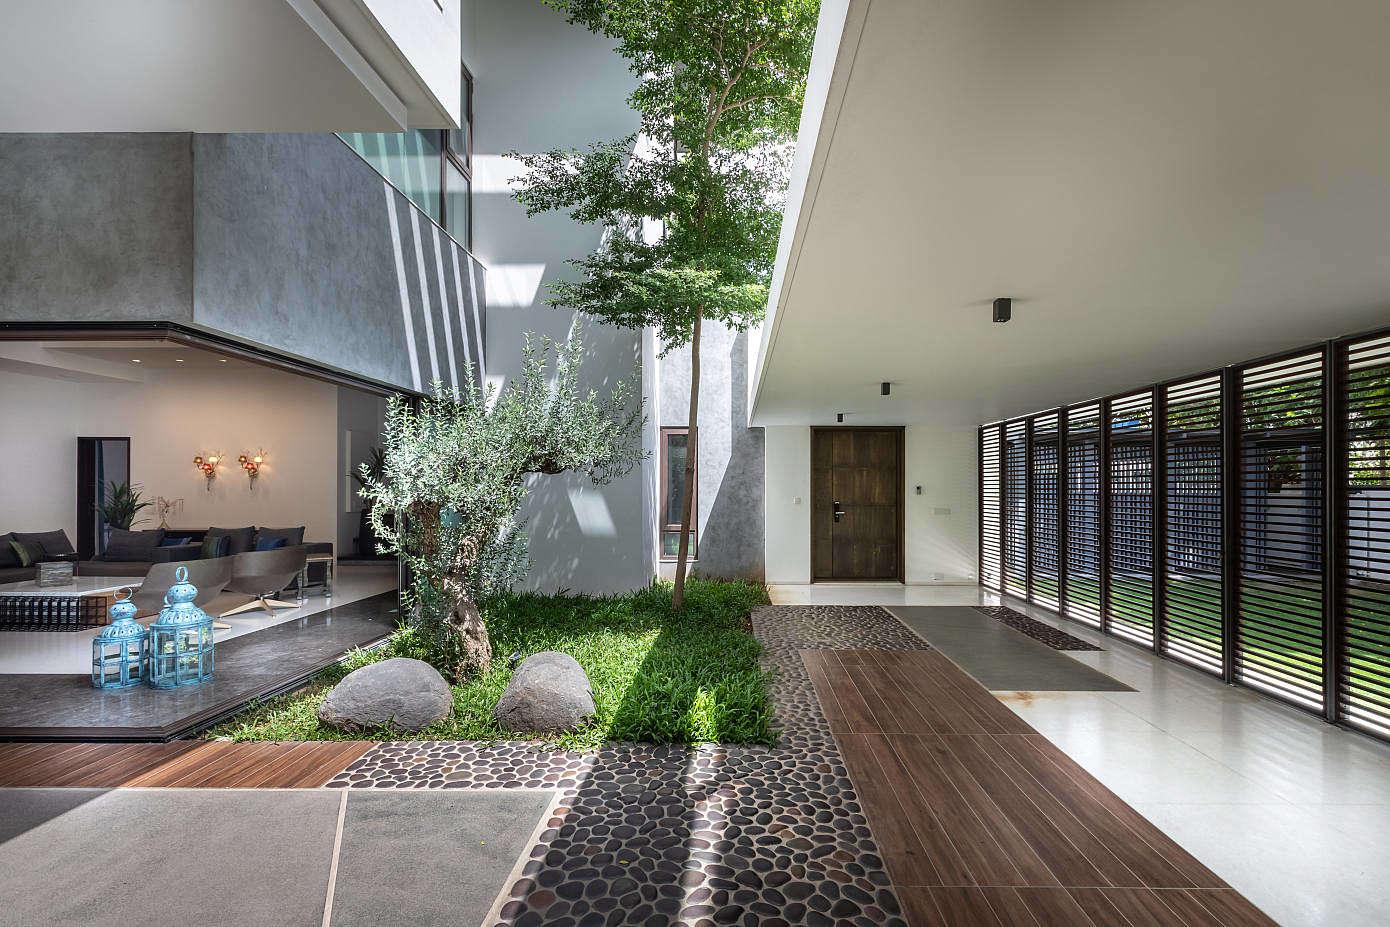 Courtyard Villa By Moriq Homeadore